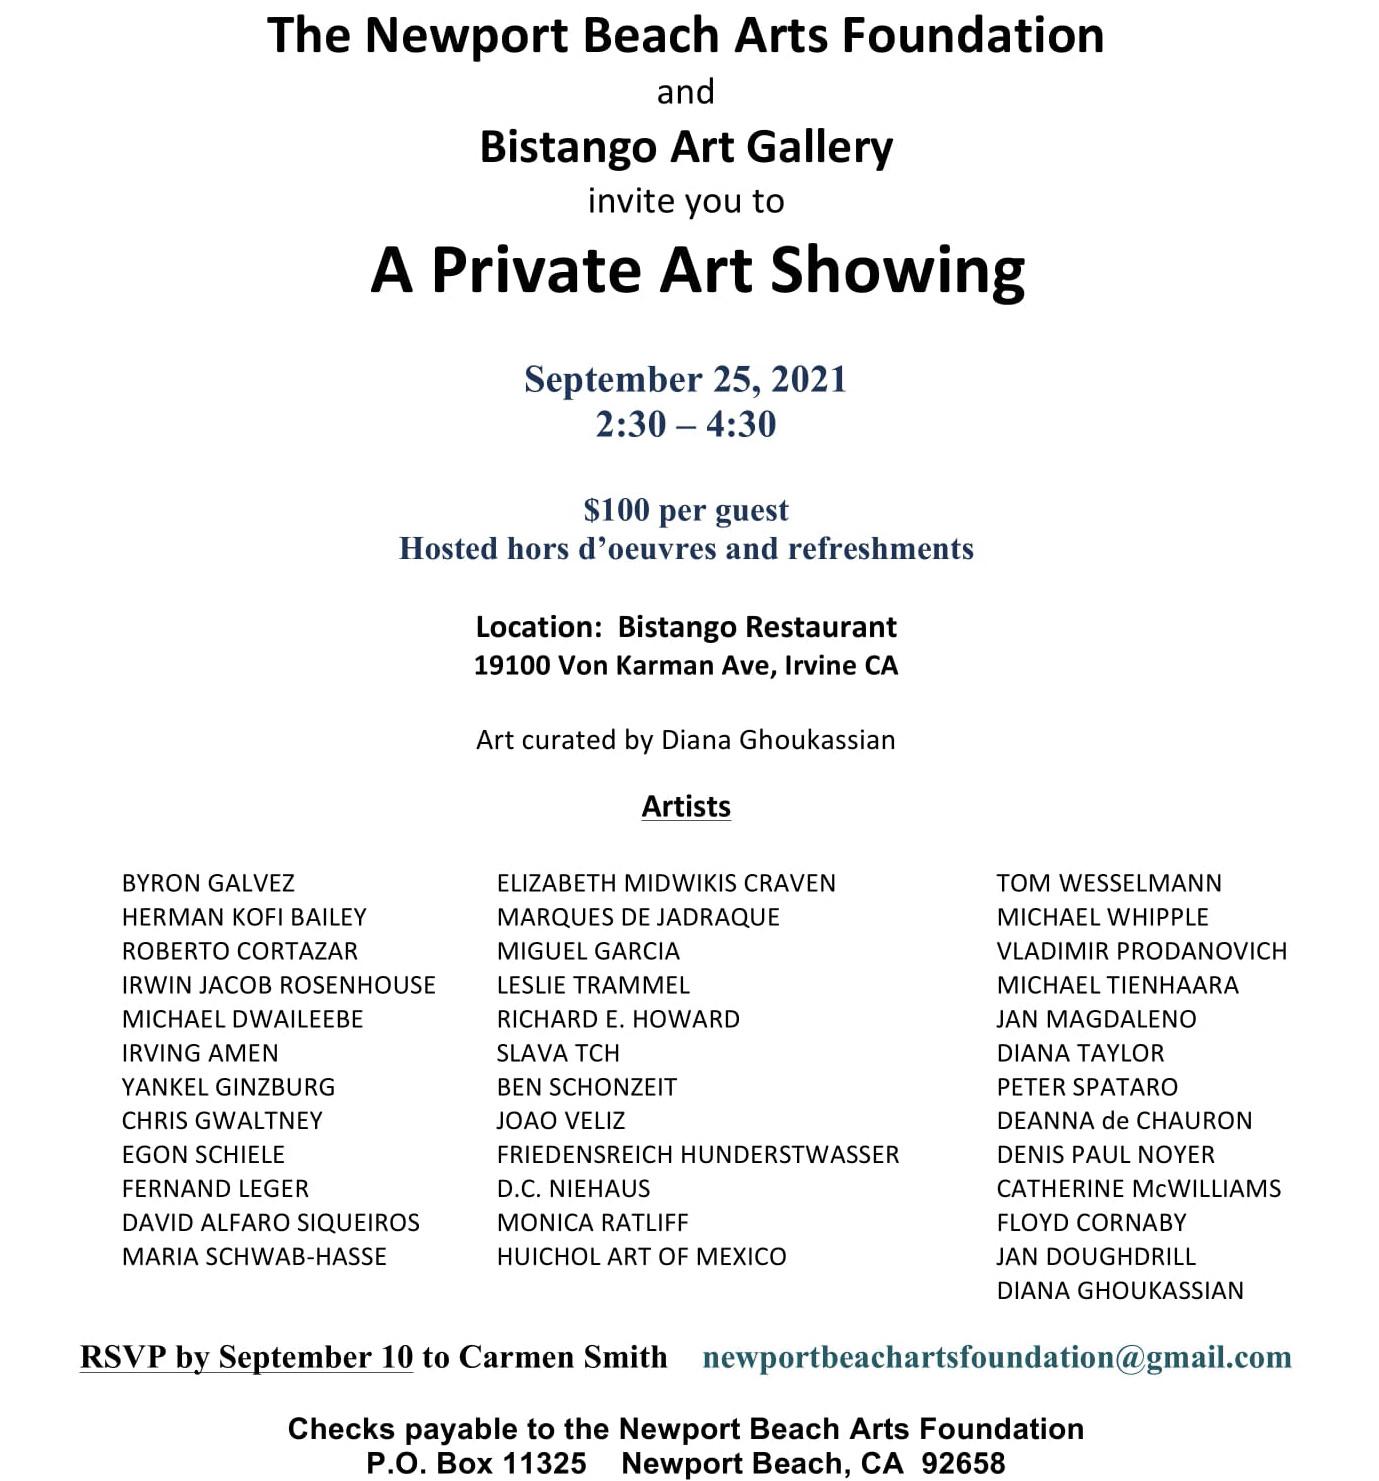 A Private Art Show